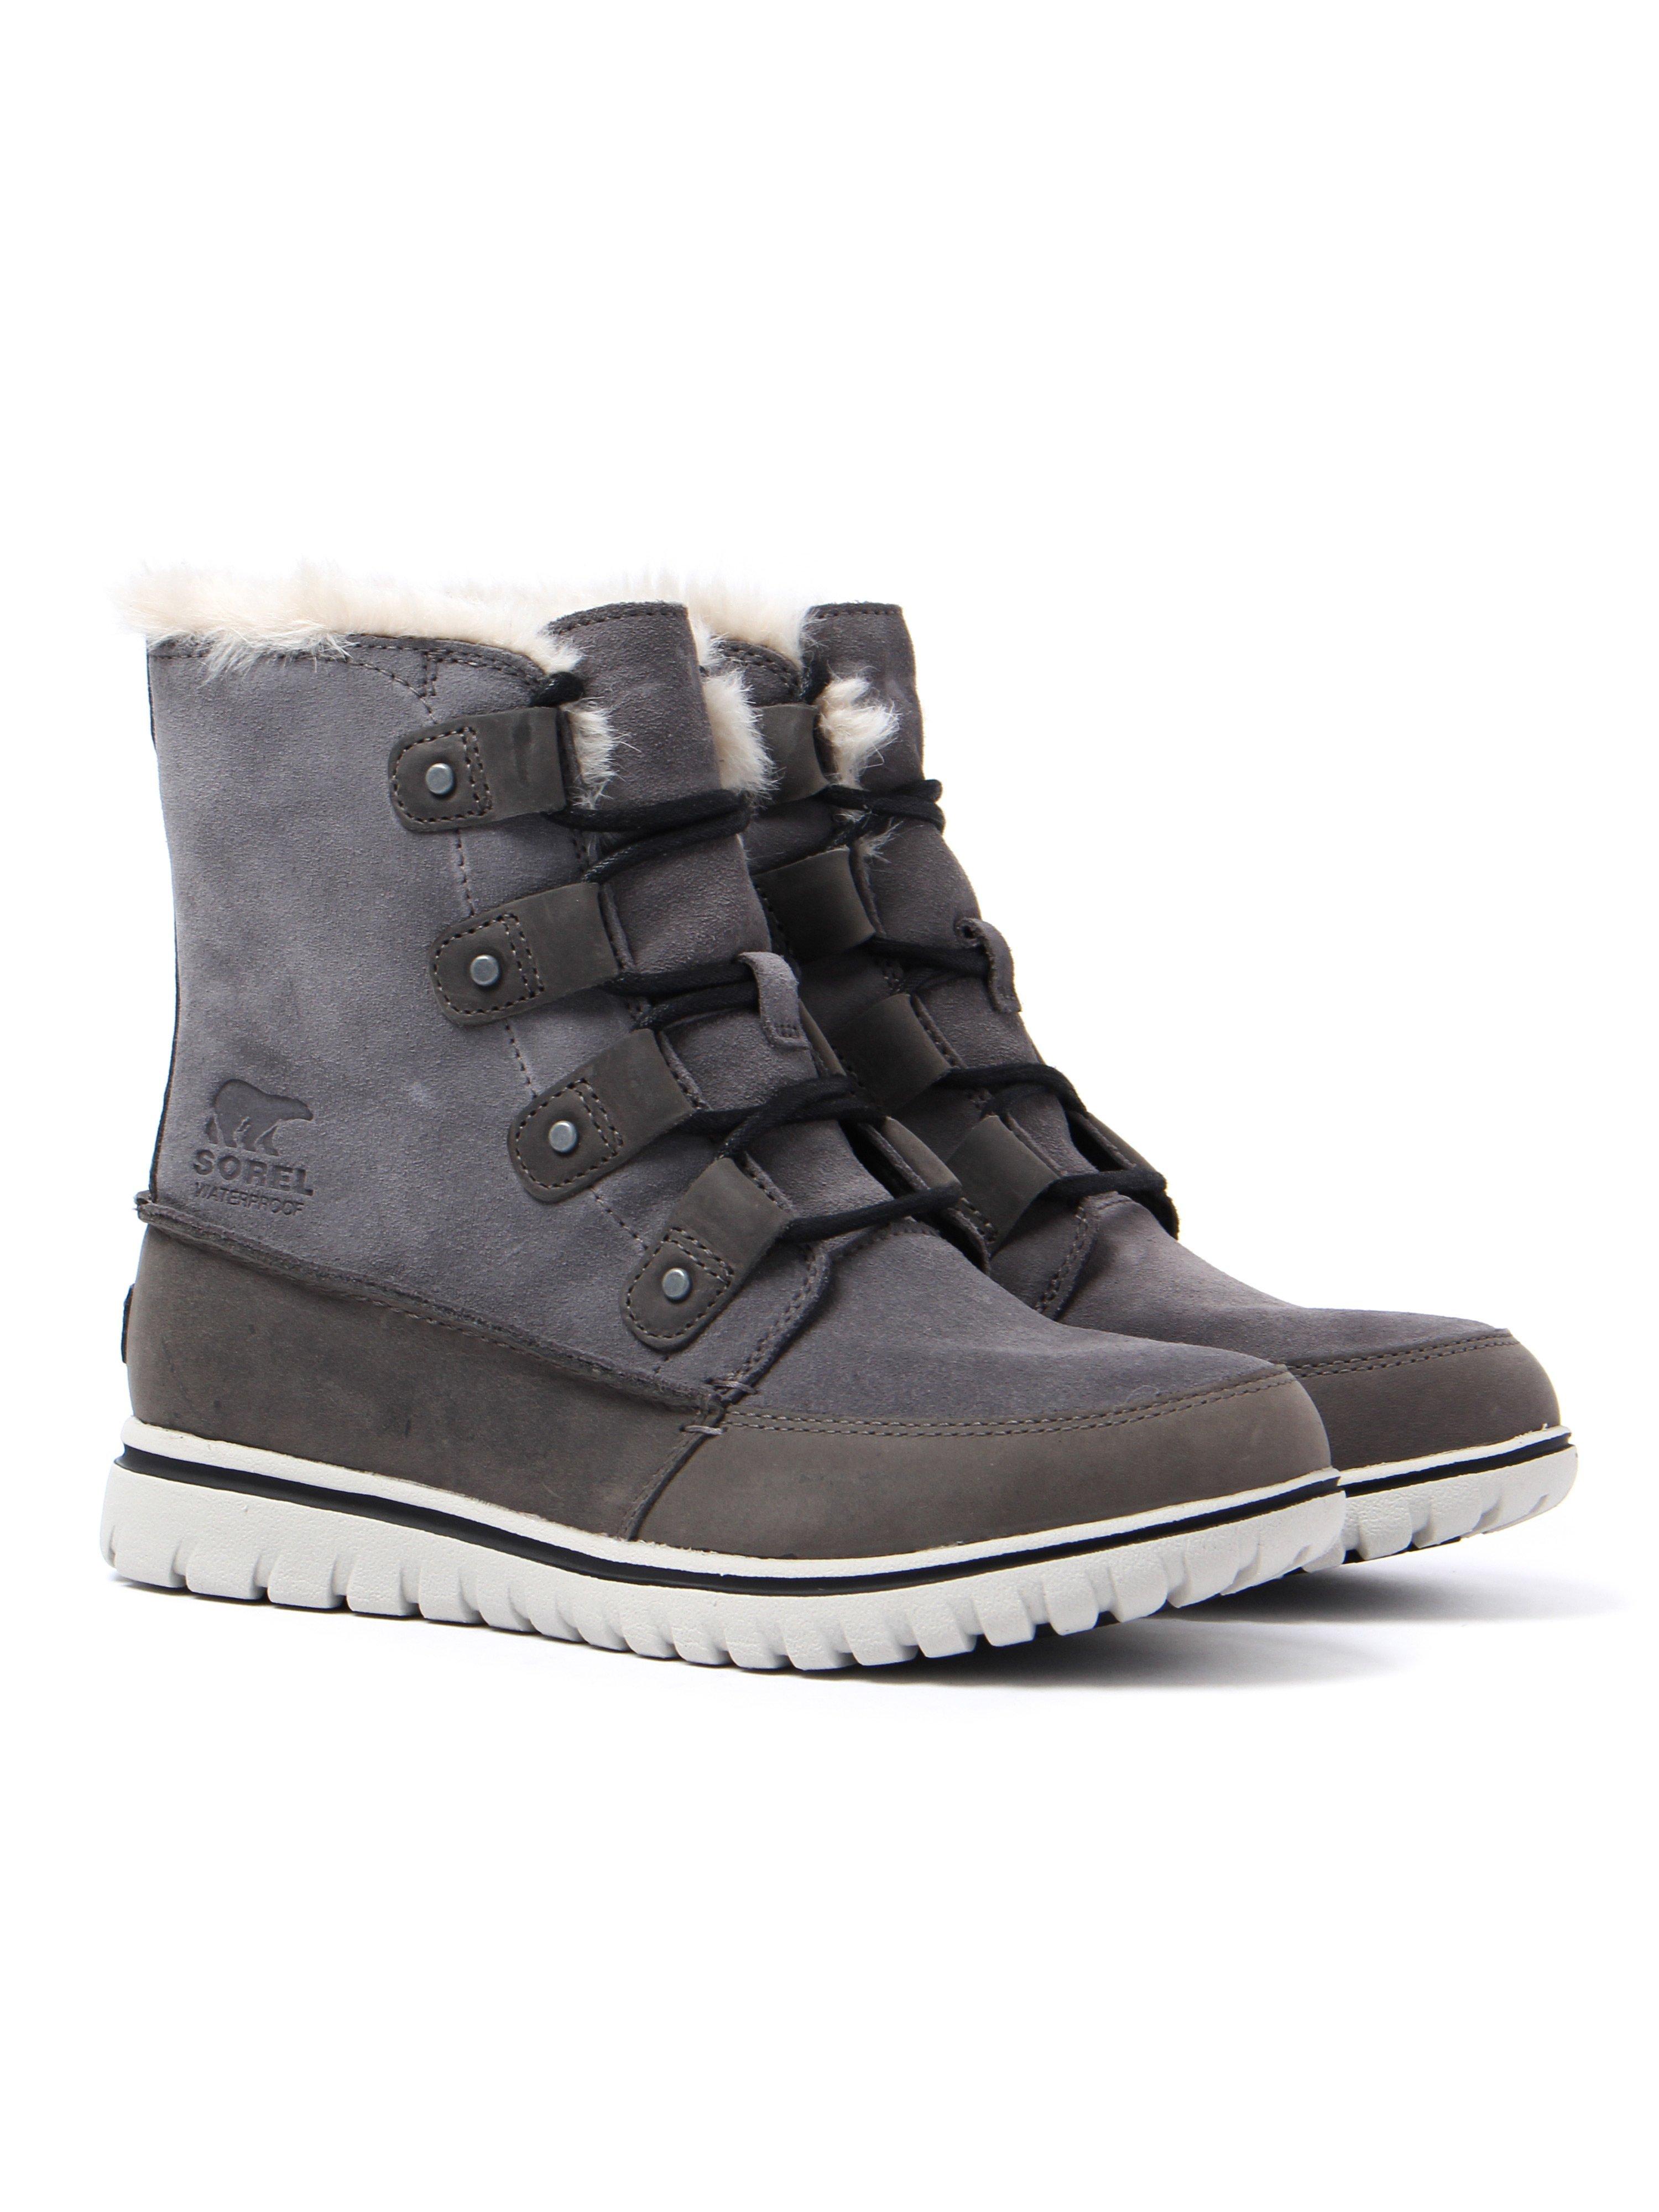 Sorel Women's Cozy Joan Boots - Quarry